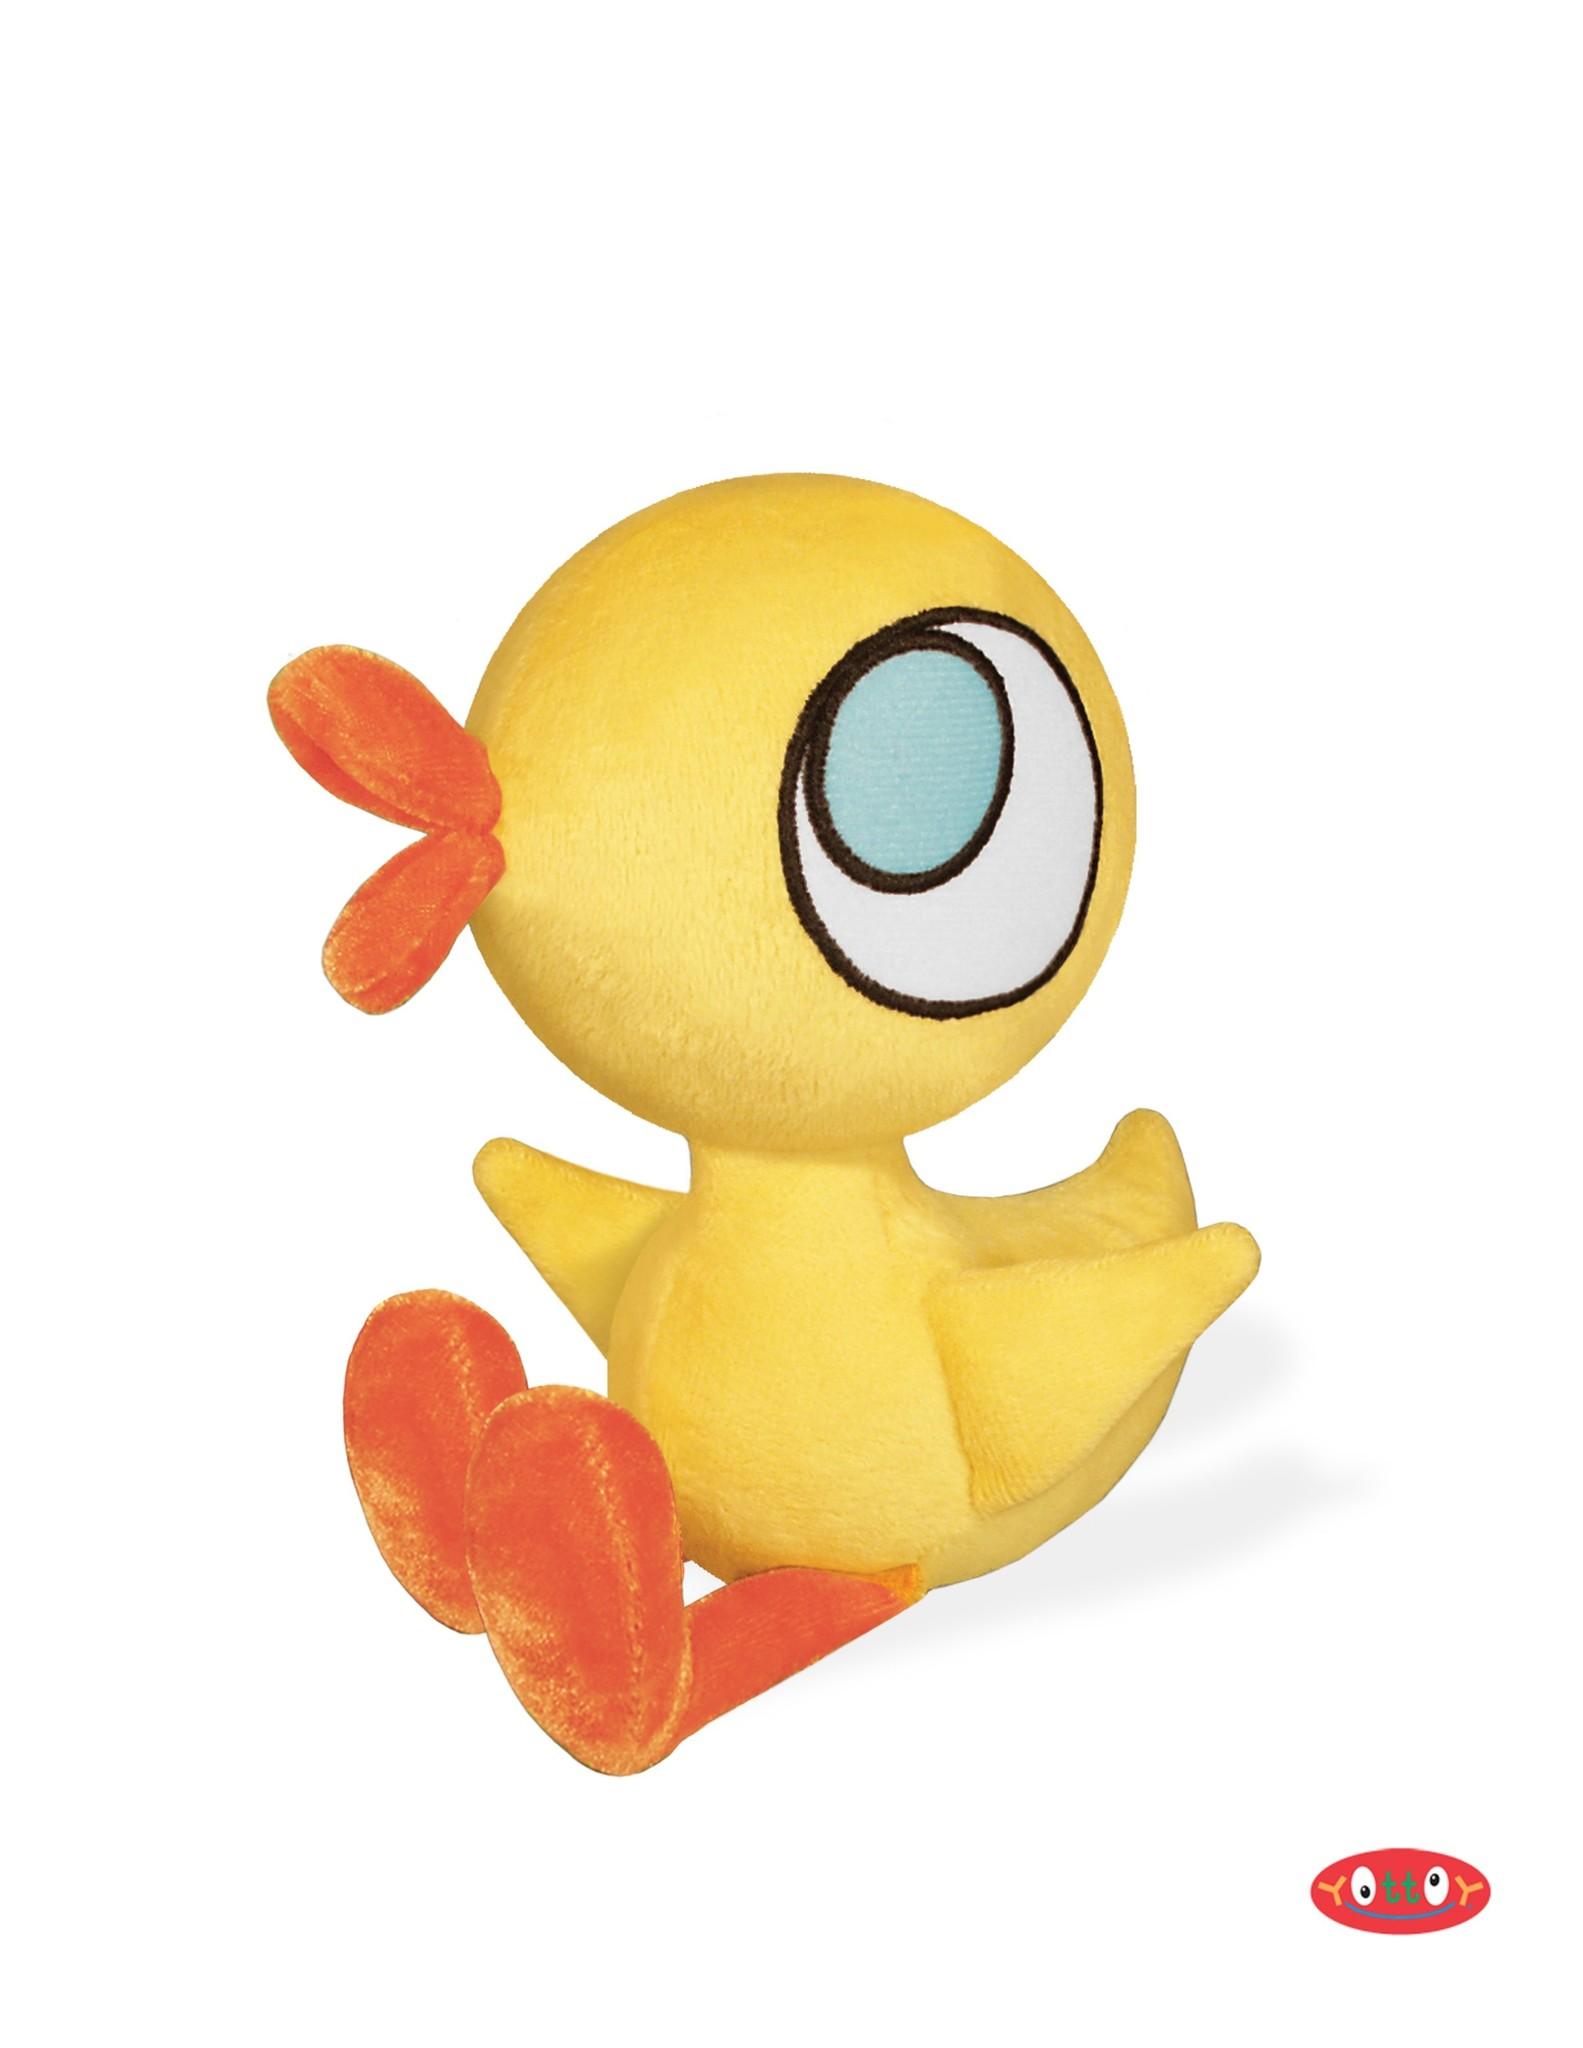 Yottoy Duckling Soft Toy